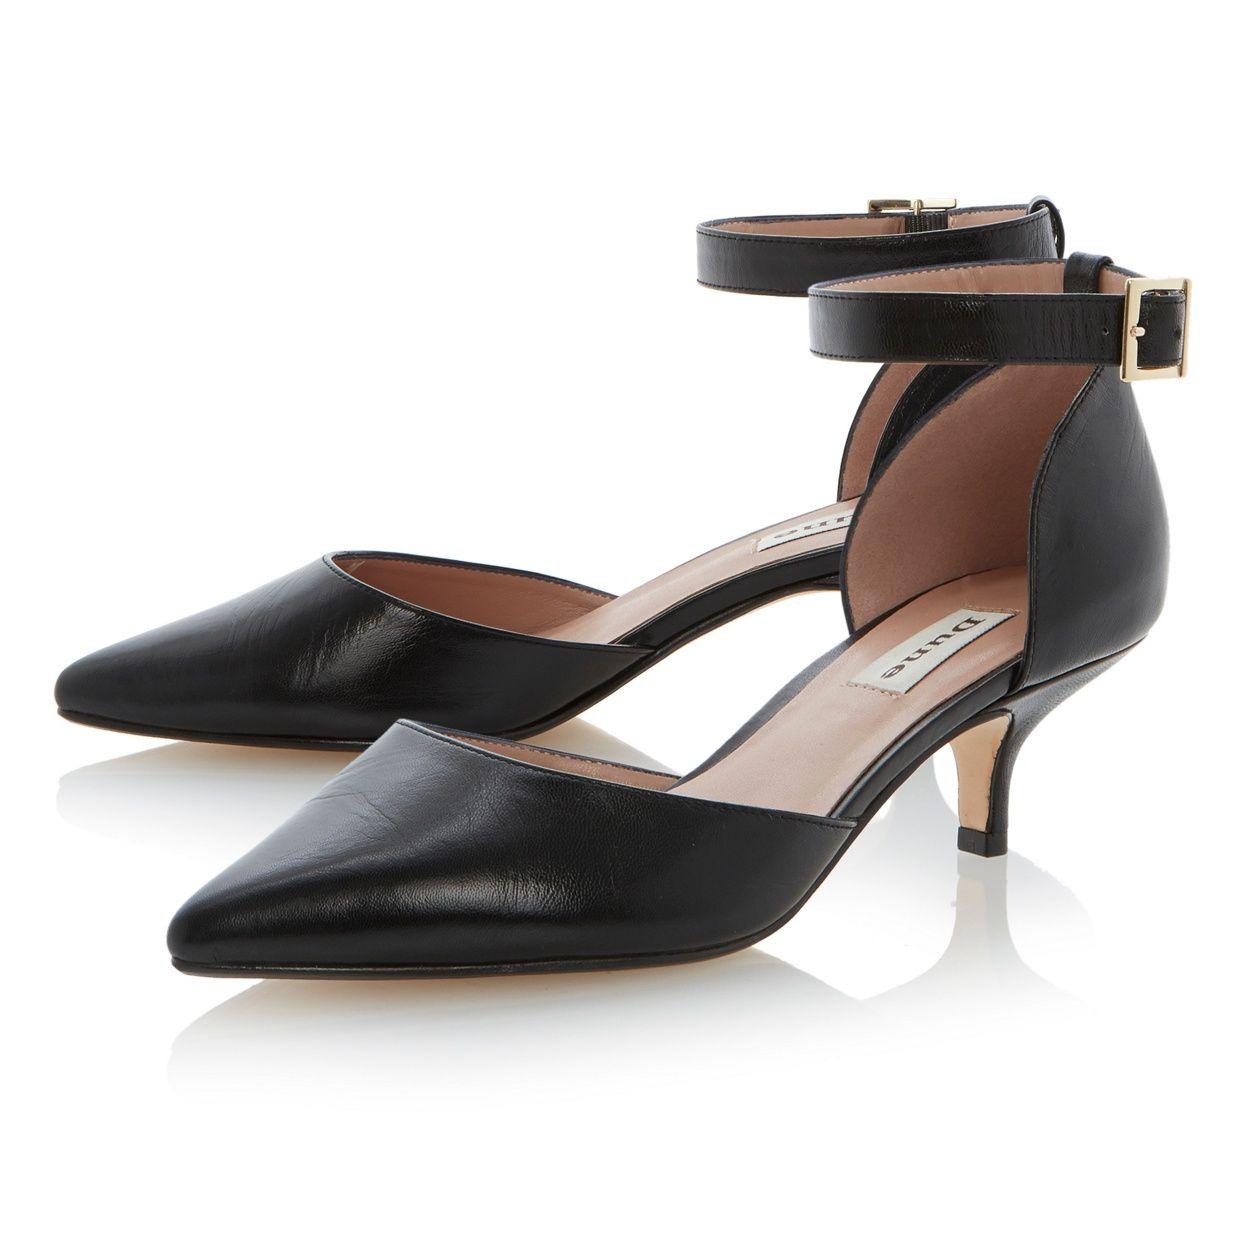 Black sandals debenhams - Dune Black Two Part Ankle Strap Kitten Heel Court Shoe At Debenhams Com